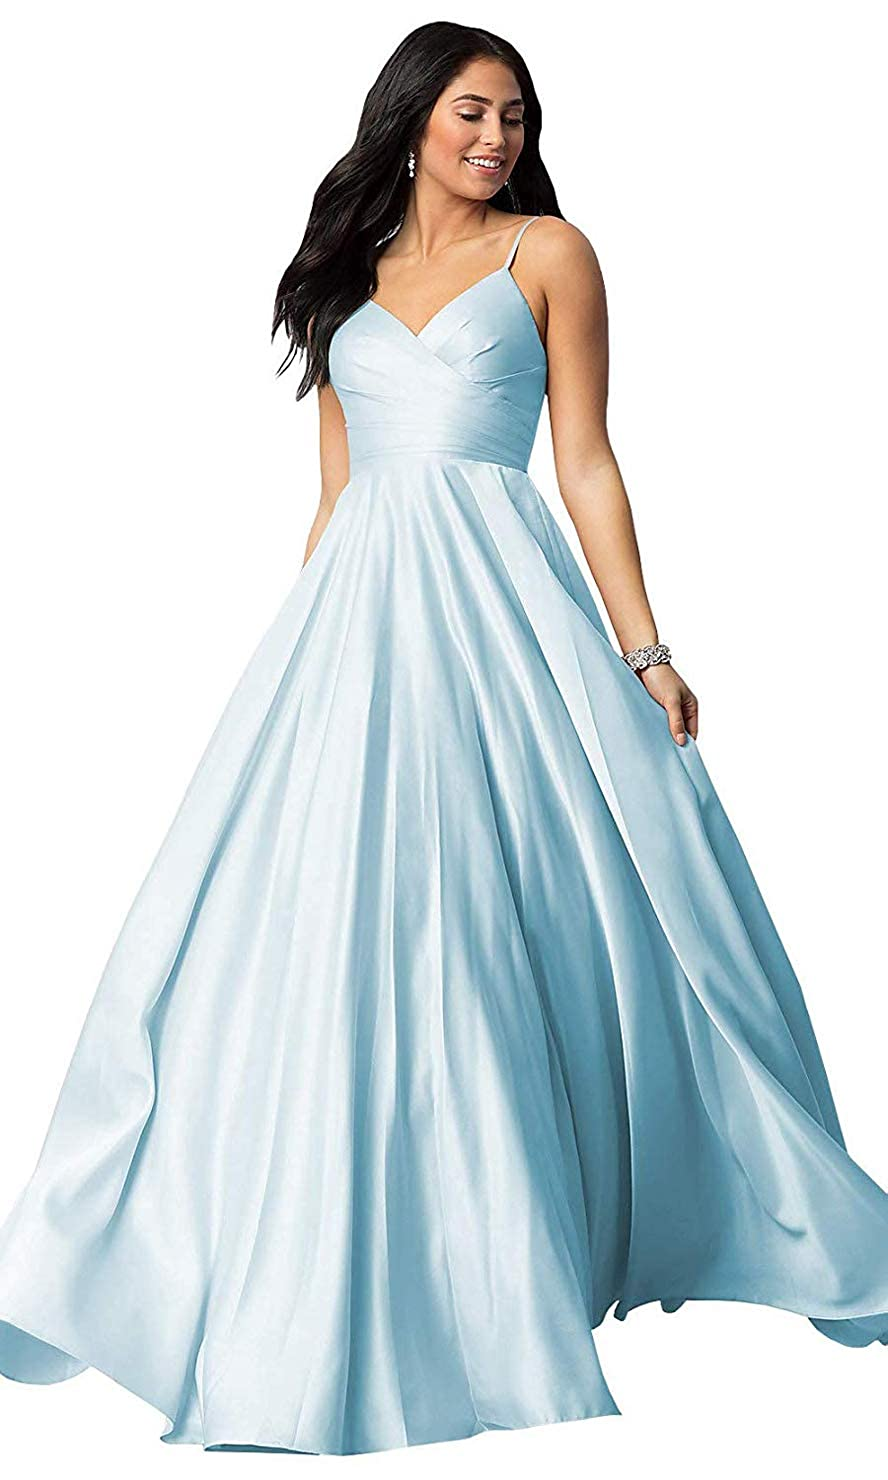 Dark Pink FeiYueXinXing Satin VNeck Prom Dresses Long Spaghetti Strap Formal Prom Evening Gown